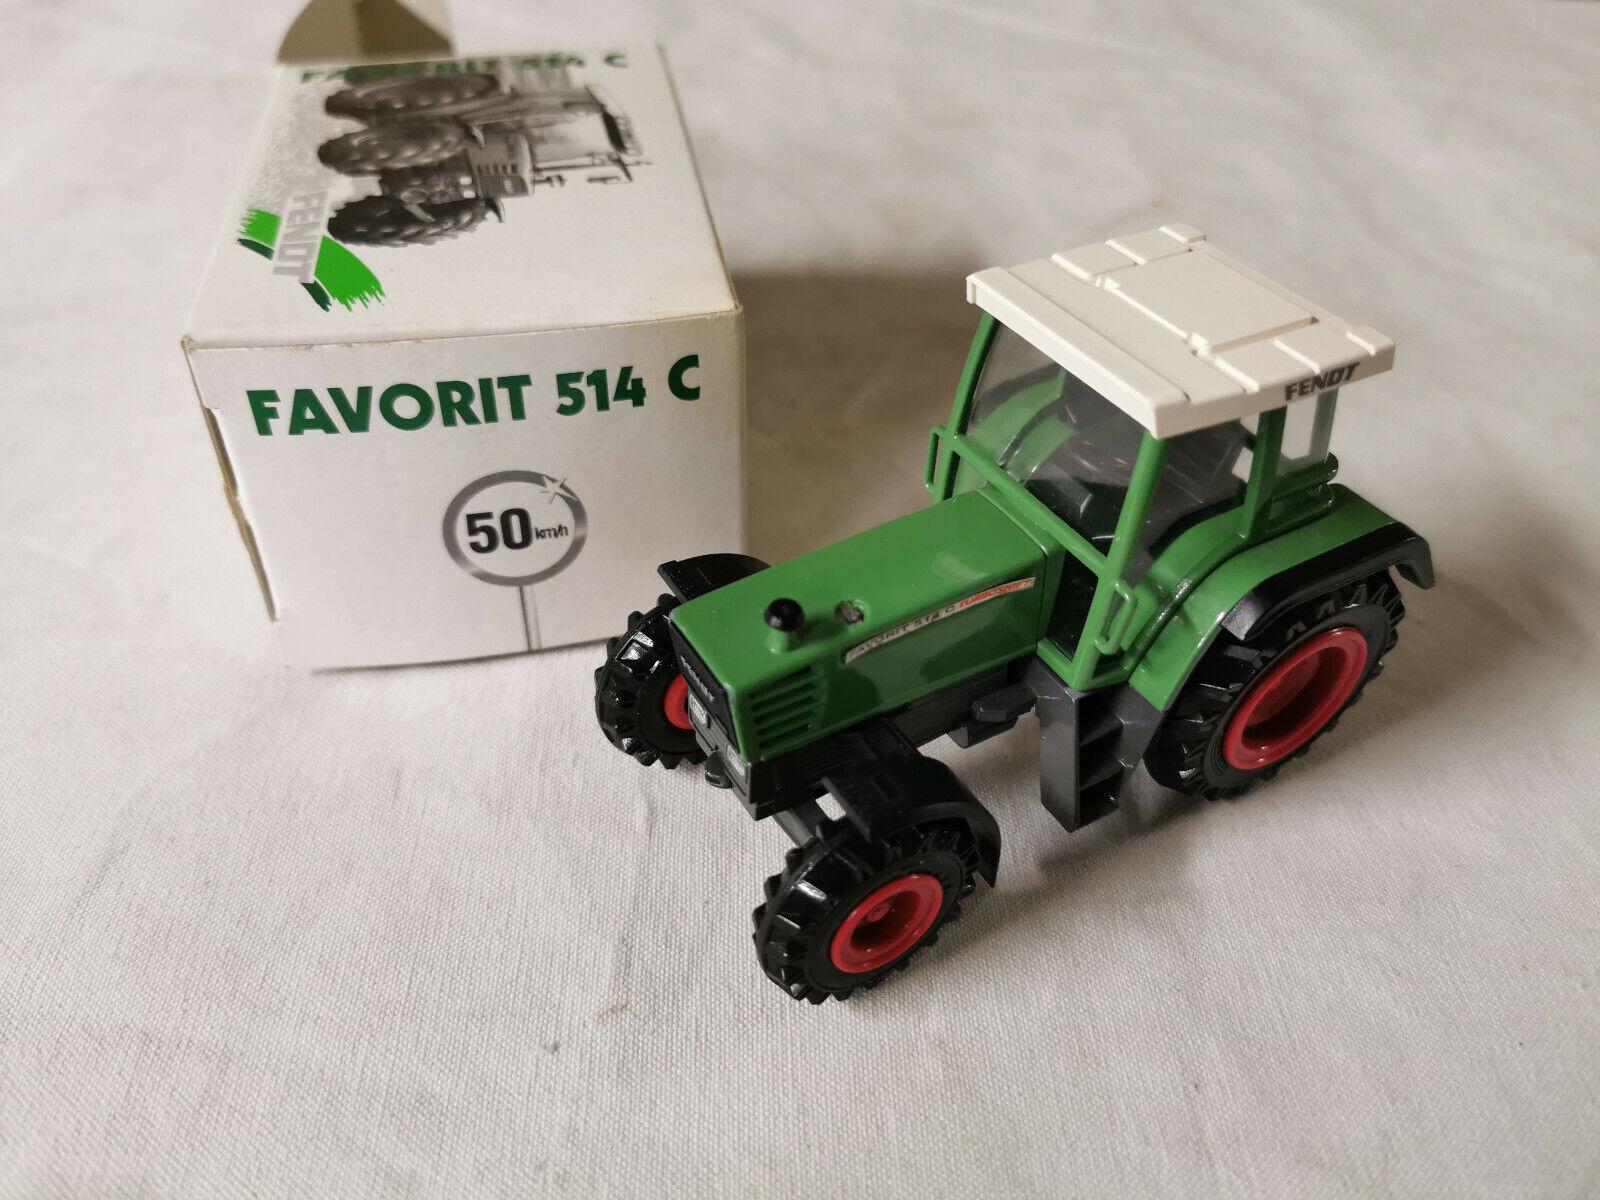 Cursor modell 1 43 th ref 792 fendt favorit 514 c